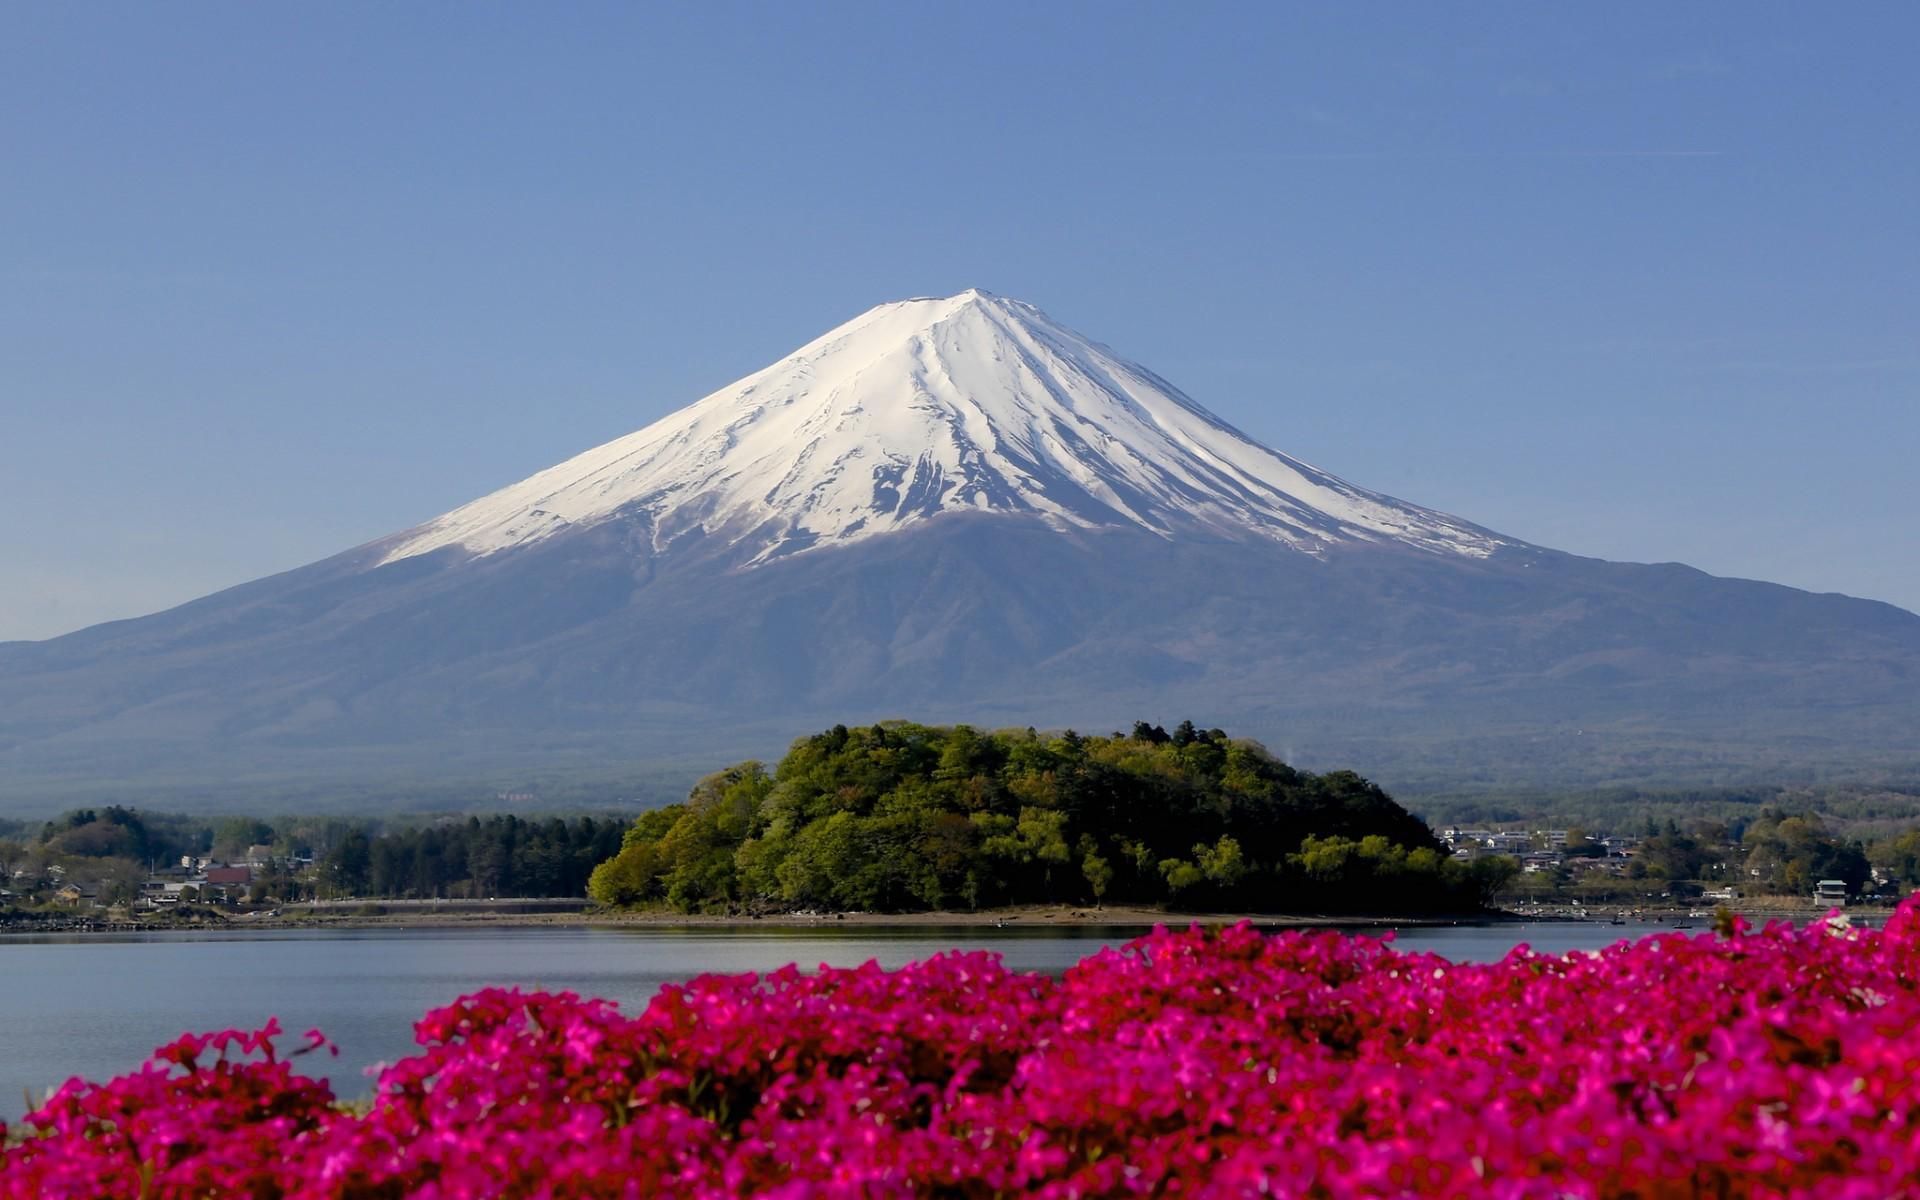 Wallpaper - Japan Landscape Mount Fuji , HD Wallpaper & Backgrounds